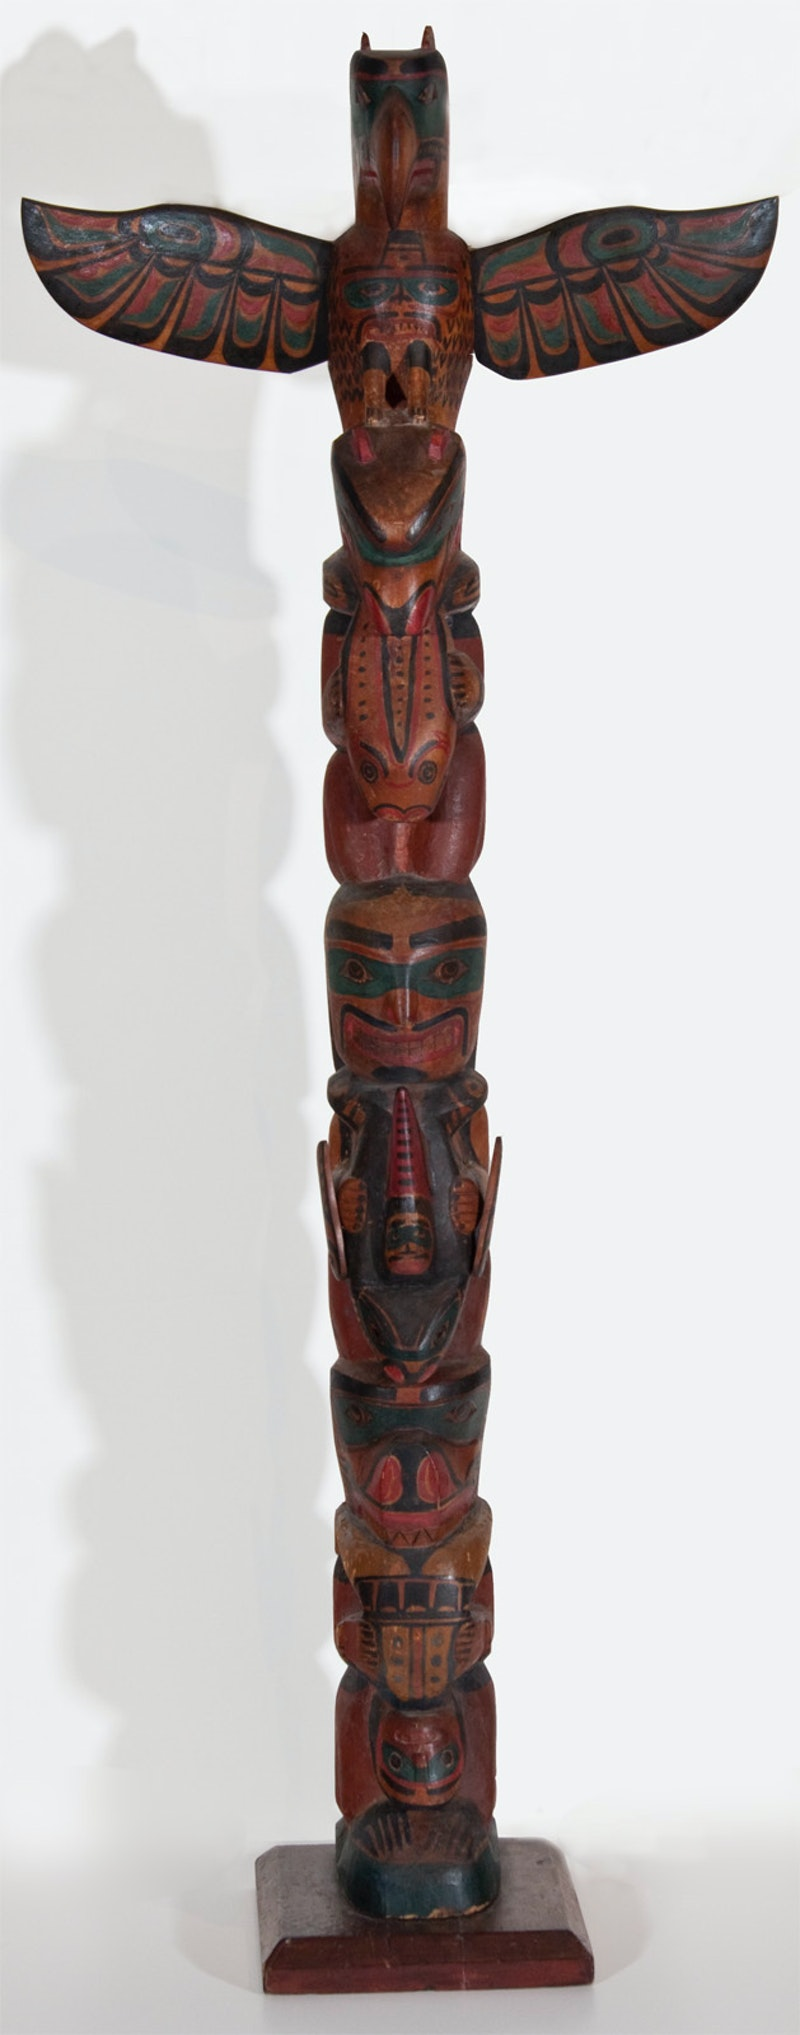 Alert Bay Totem Image 2